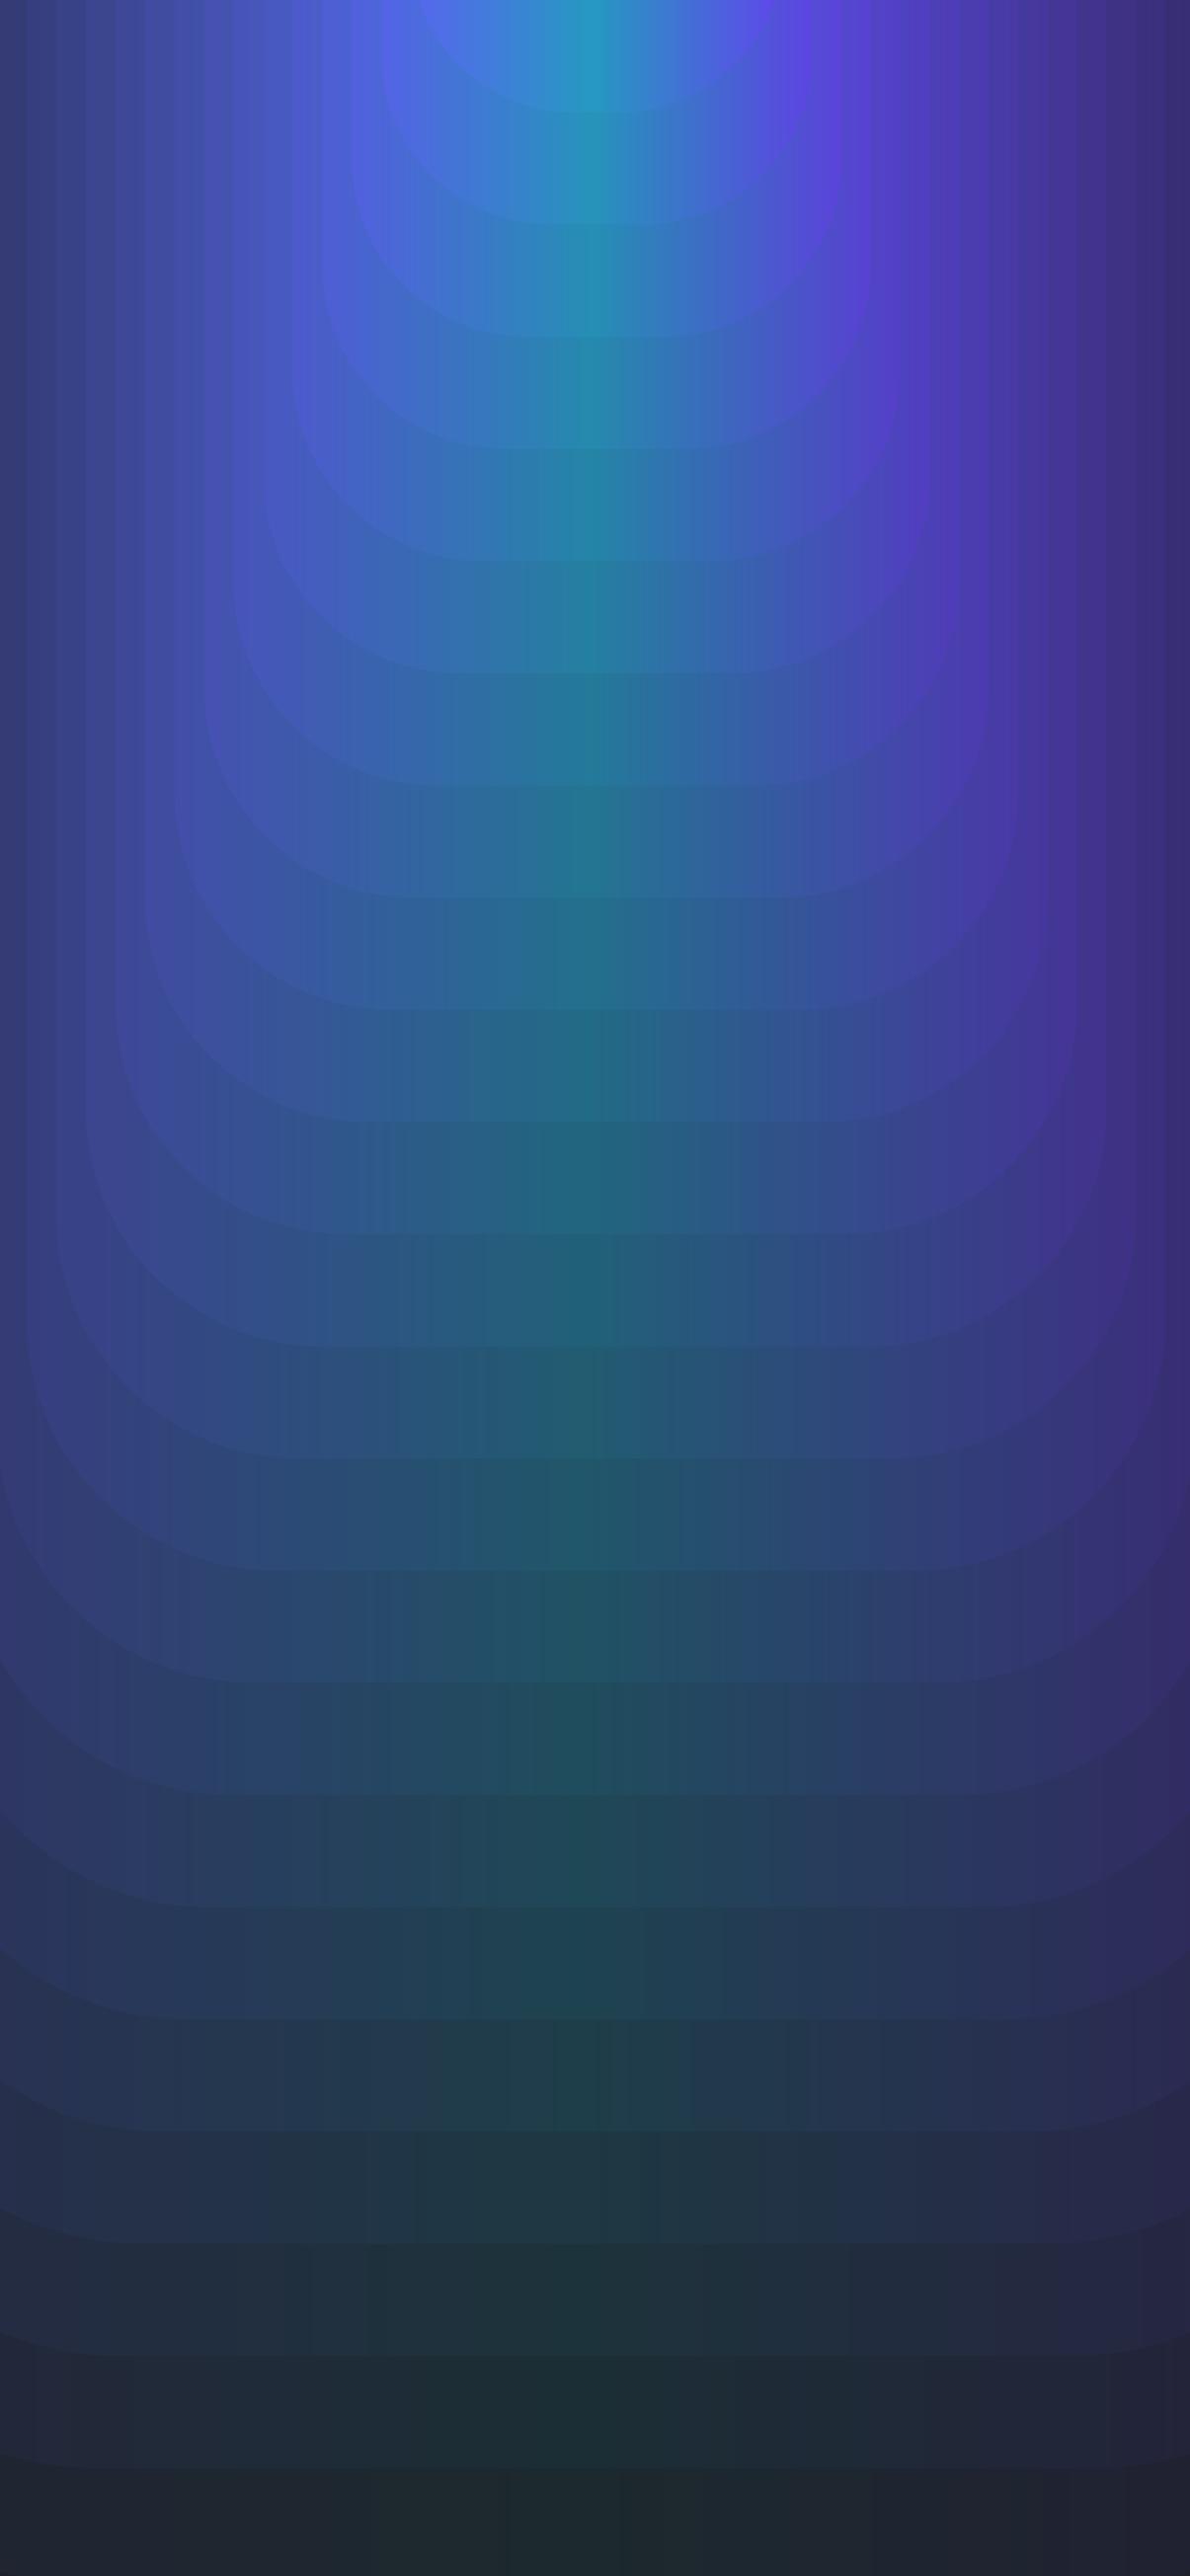 gradient.blue.wallpaper.for.mobile.phone